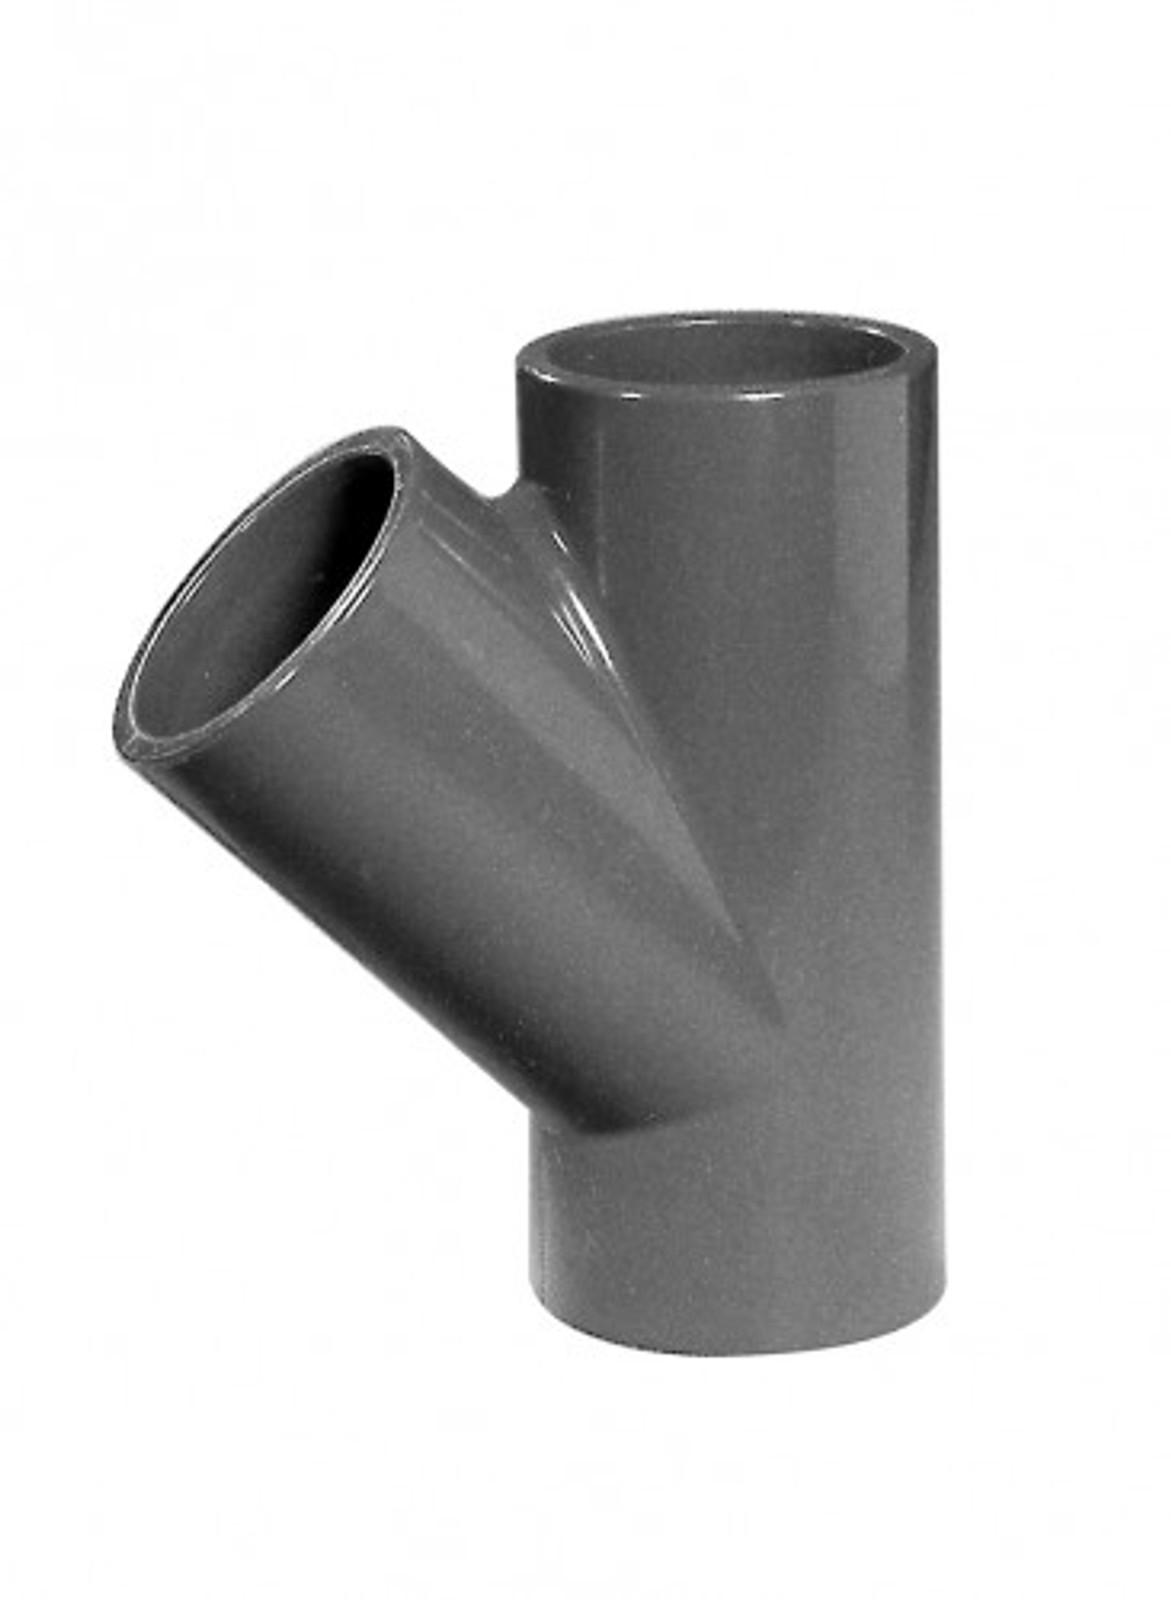 T-Stück 45°, 75 mm aus PVC